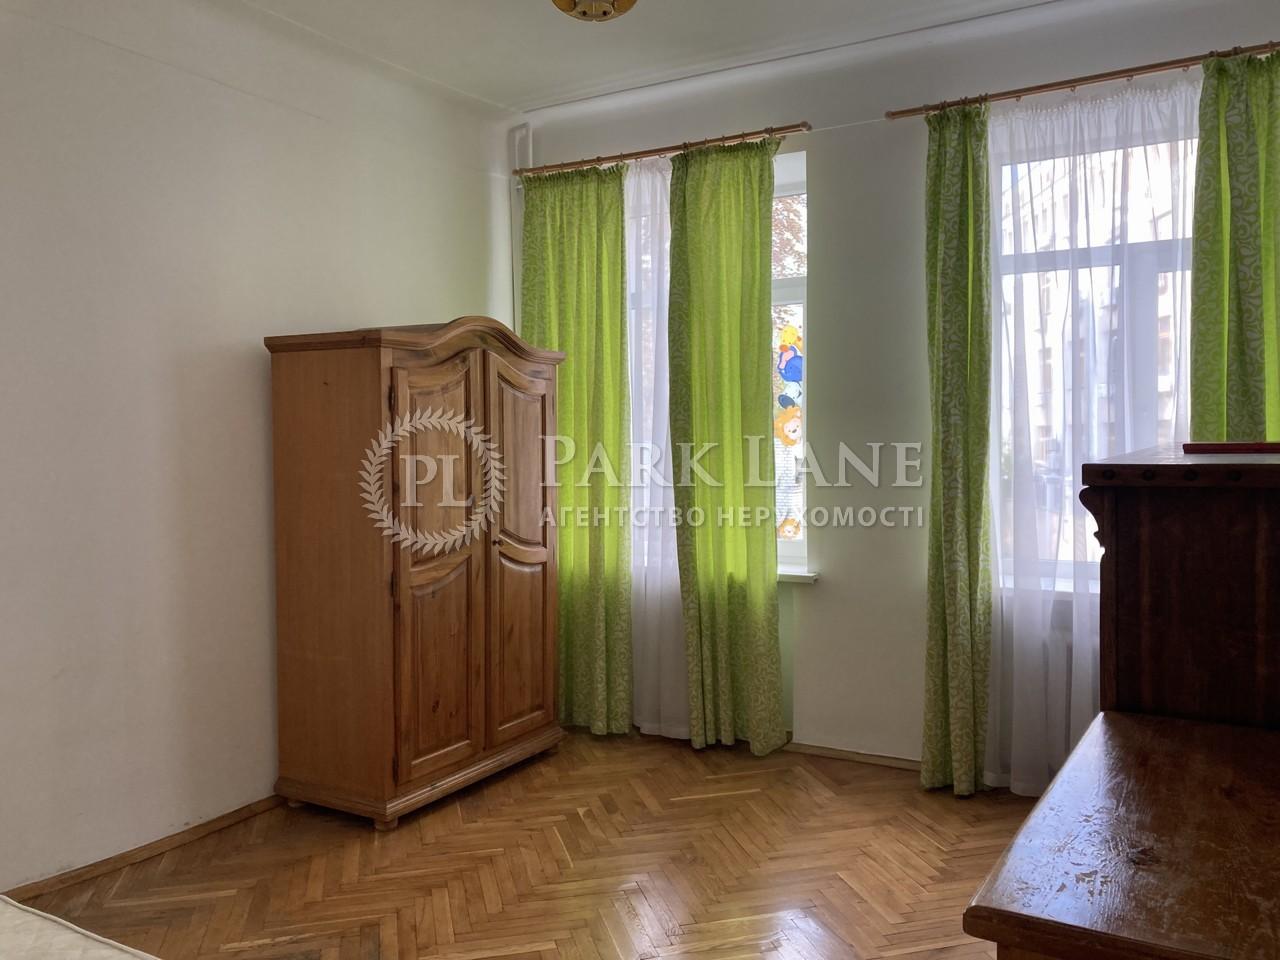 Квартира I-33430, Богомольца Академика, 7/14, Киев - Фото 7